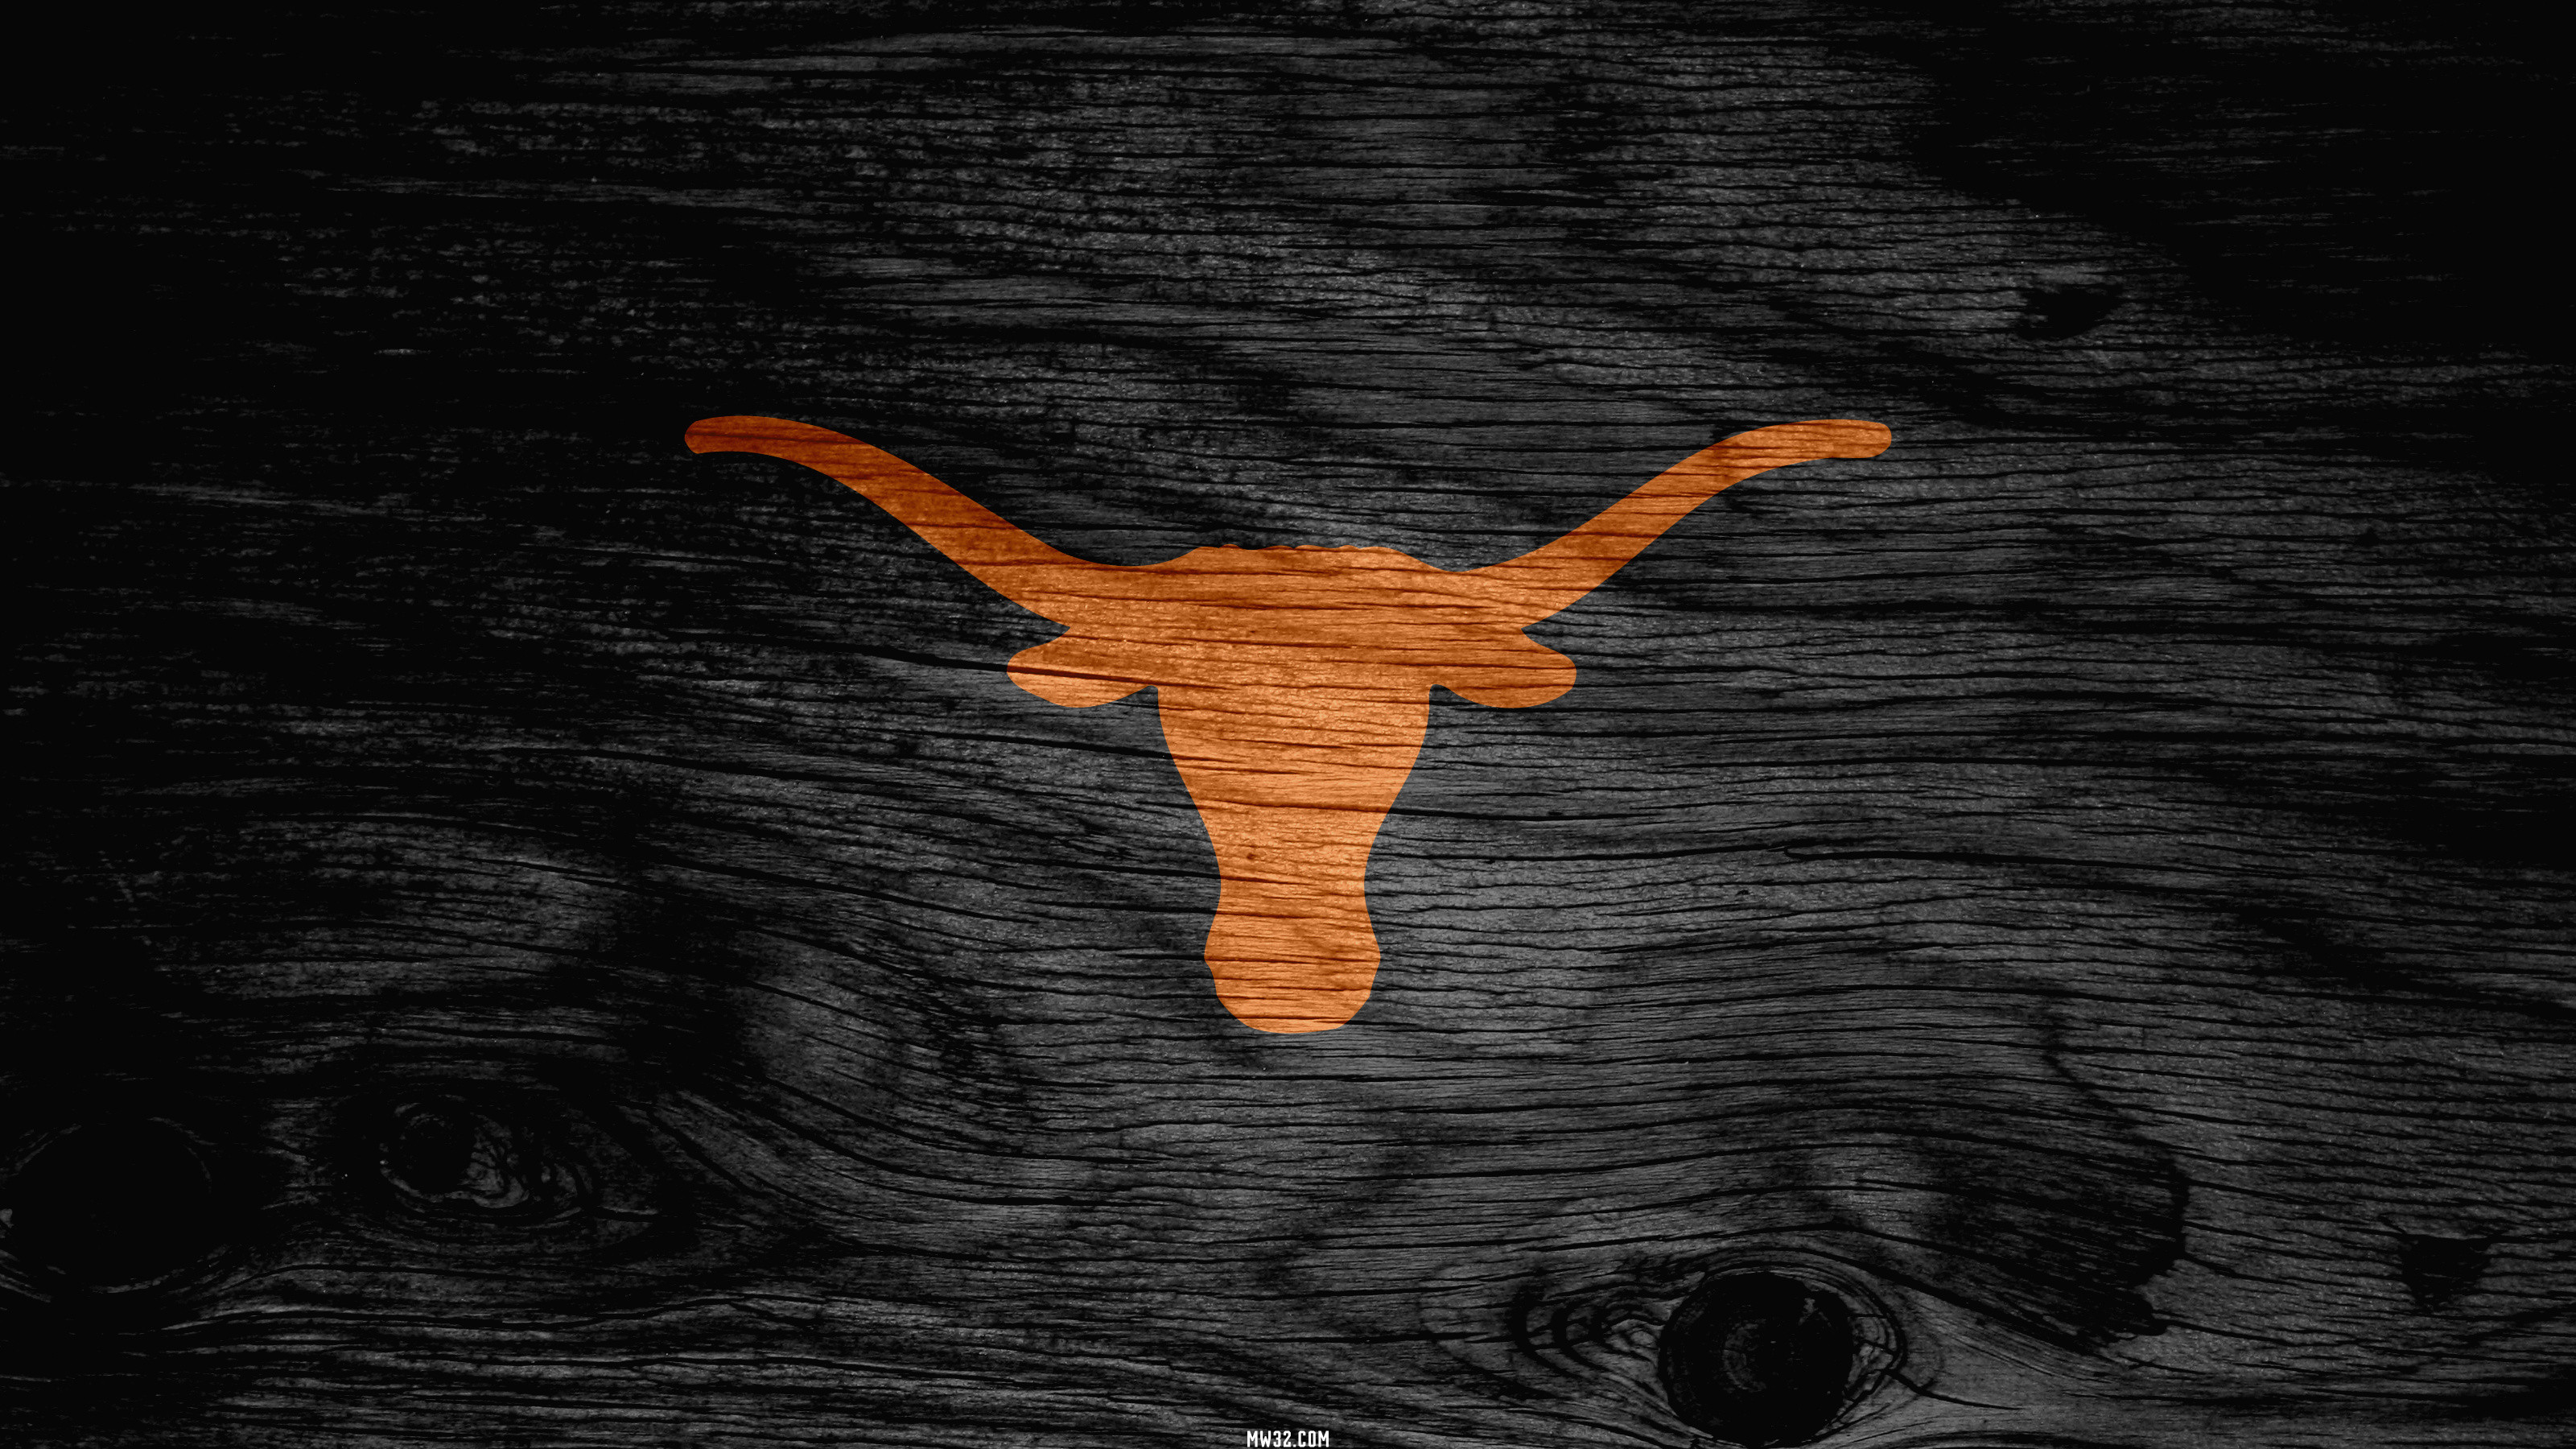 2013 NCAA FBS Weathered Wood Wallpapers   All 125 teams [3201x1800 3201x1800